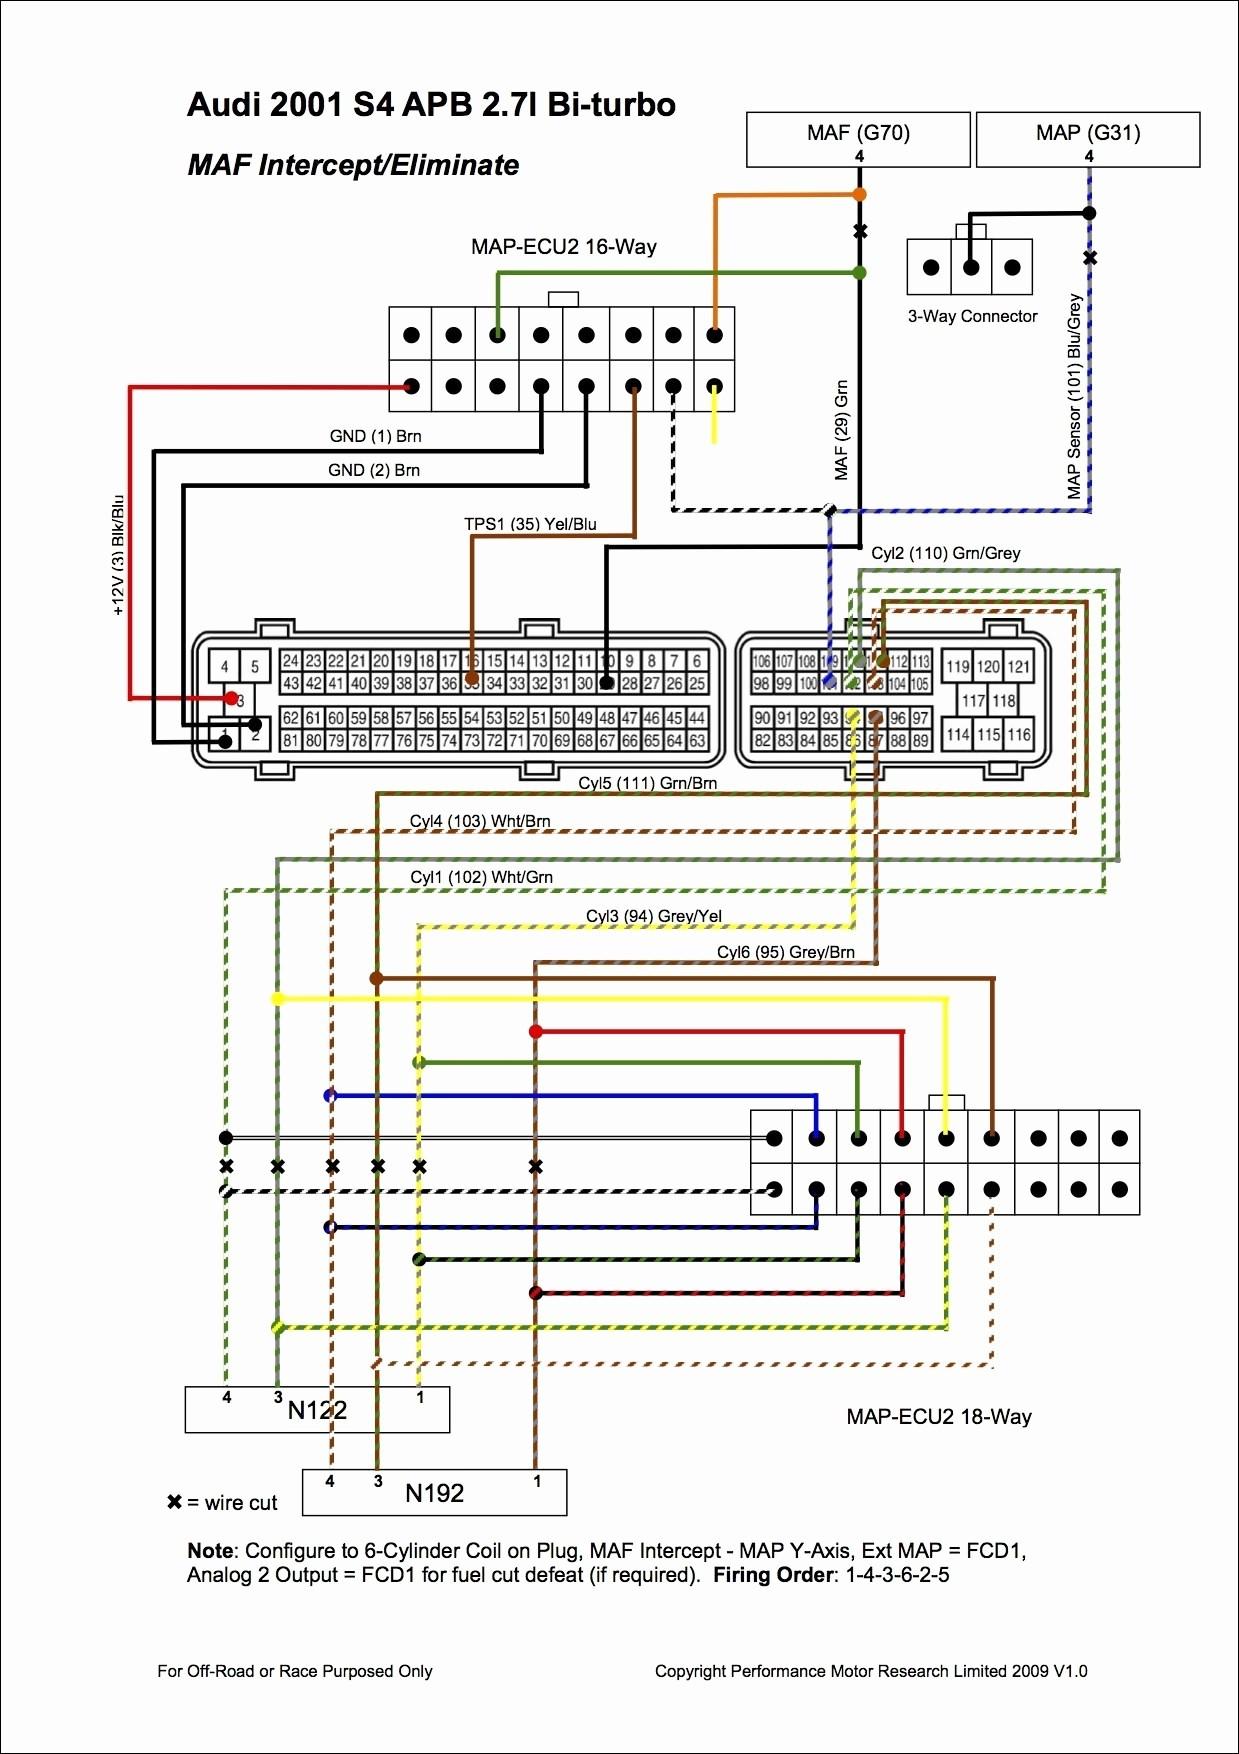 EL_8581] Coachmen Rv Wiring Diagram Wiring Harness Wiring Diagram Wiring  Download Diagram   Ford F53 Motorhome Chassis Wiring Diagram      Rmine Anal Wigeg Mohammedshrine Librar Wiring 101